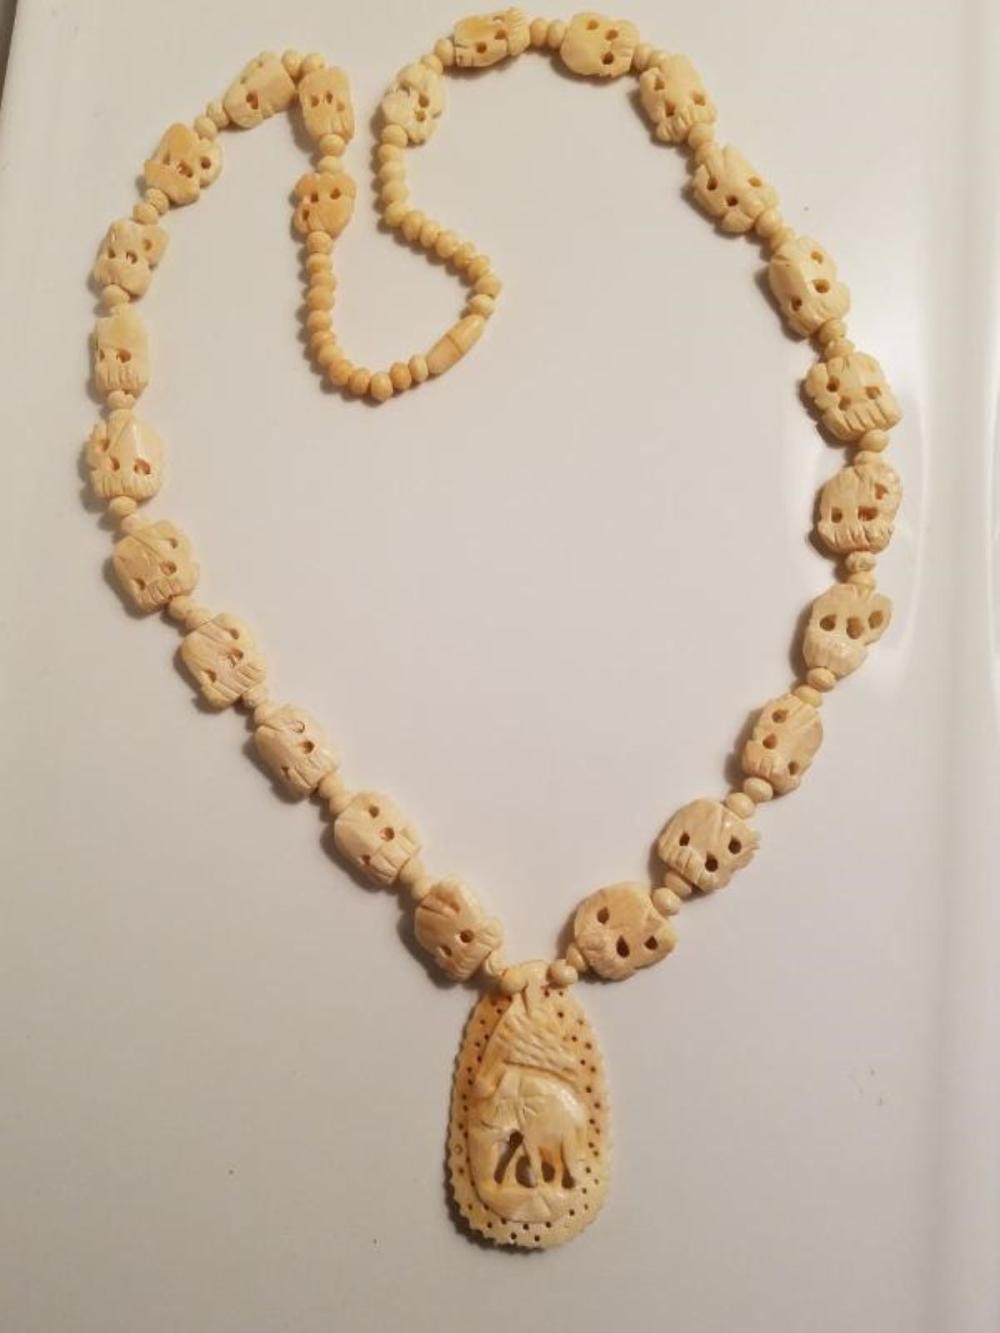 Vtg Hand Carved Bovine Bone Necklace And Pendant Elephants